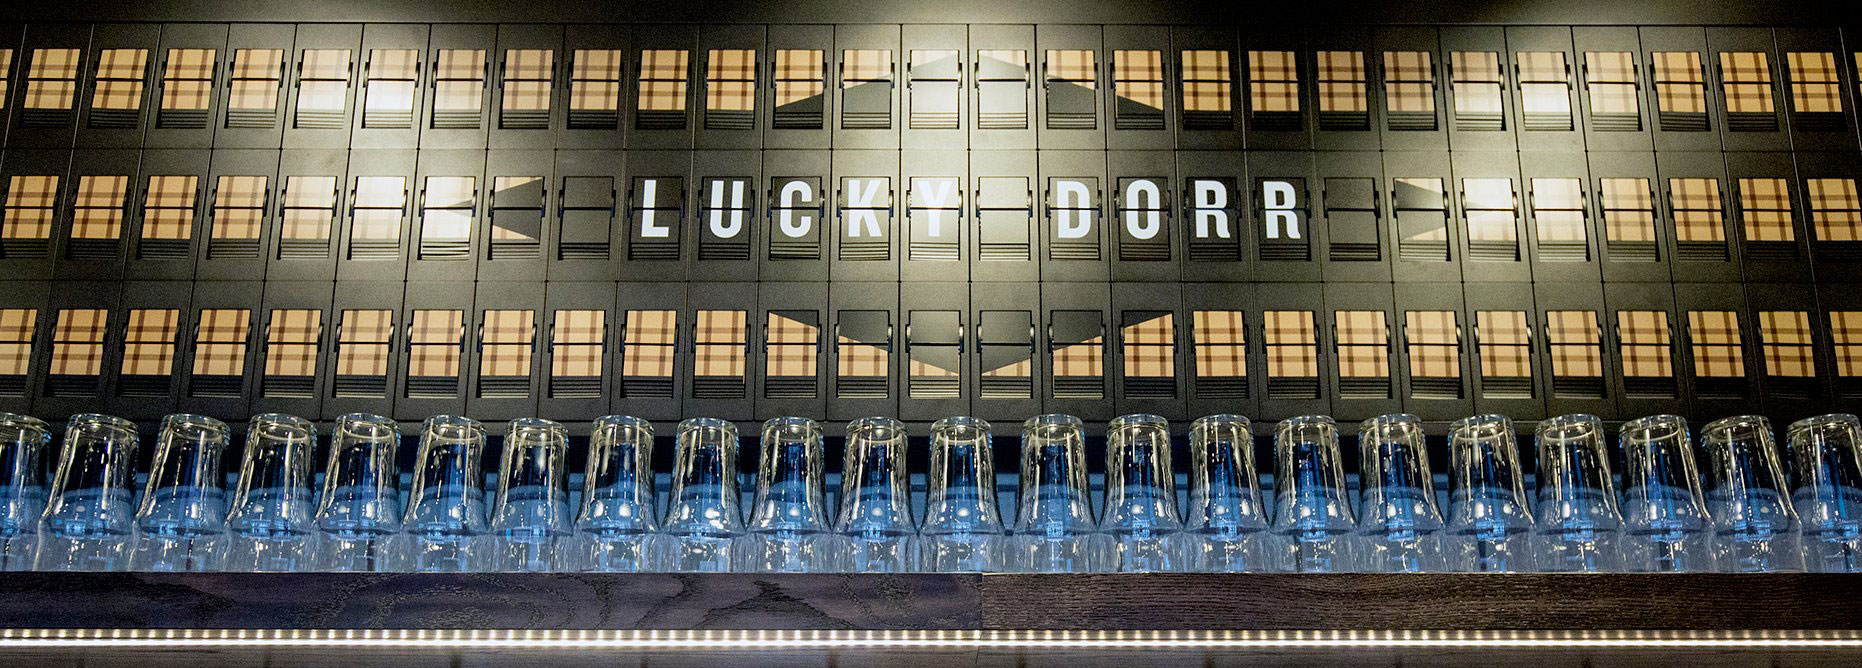 Lucky Dorr, success through social media and split flap